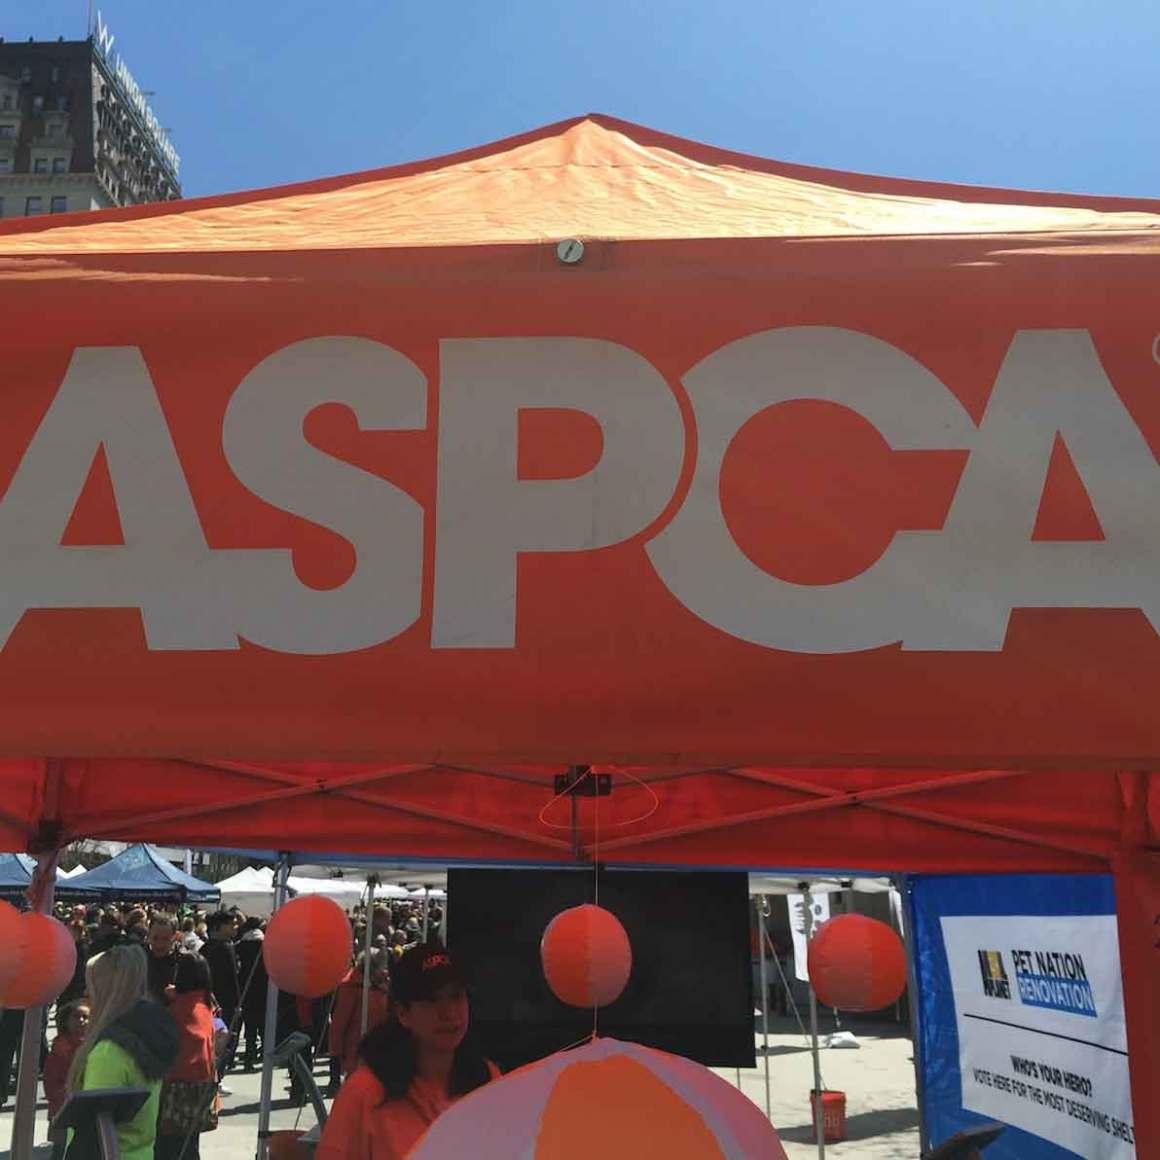 Adoptapalooza and the ASPCA's 150th Anniversary